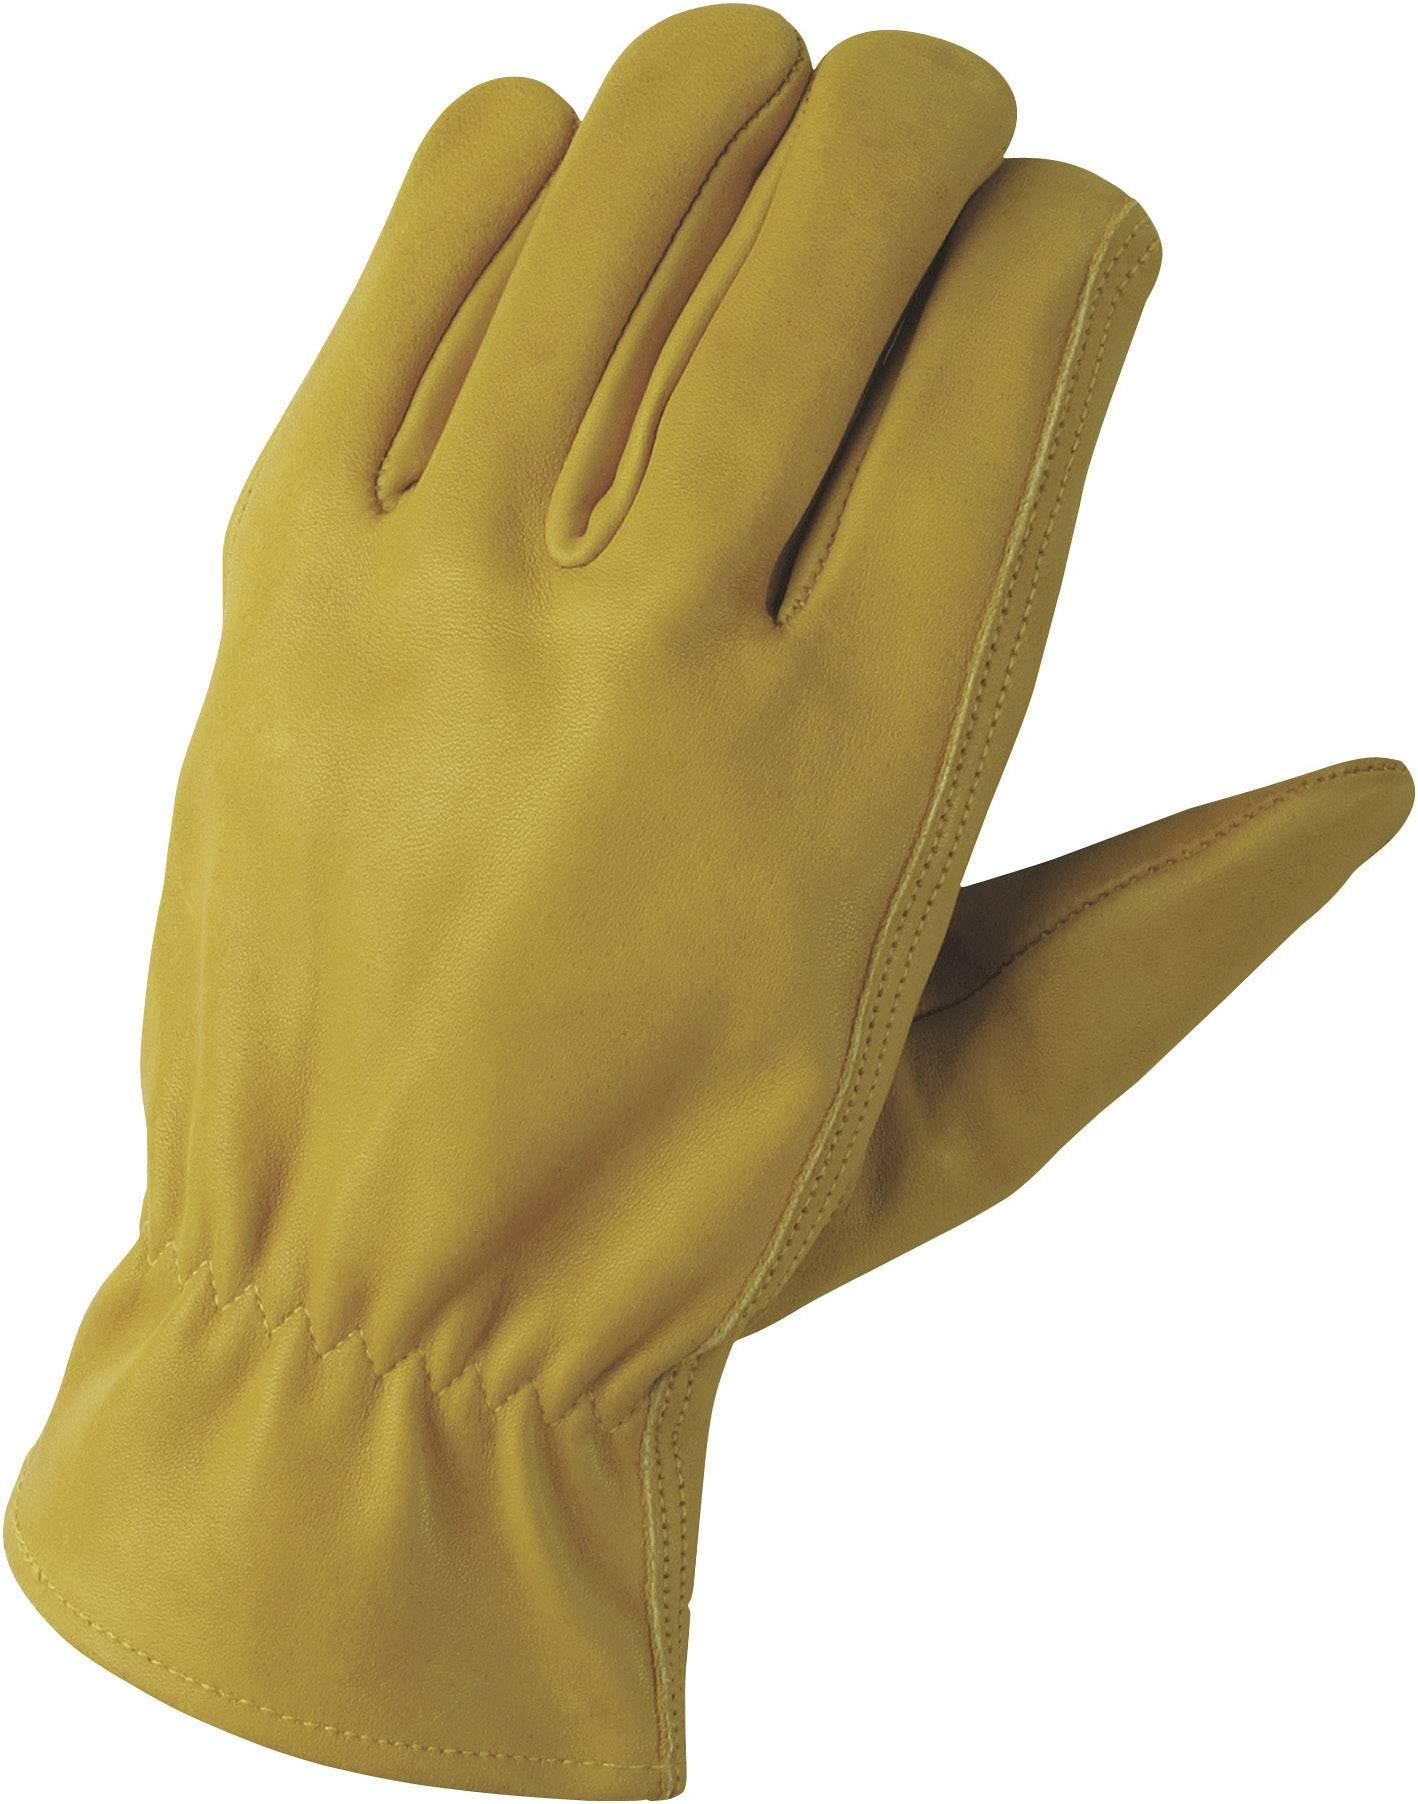 Montážne rukavice FerdyF. Conductor Garten 1610, velikost rukavic: 8, M